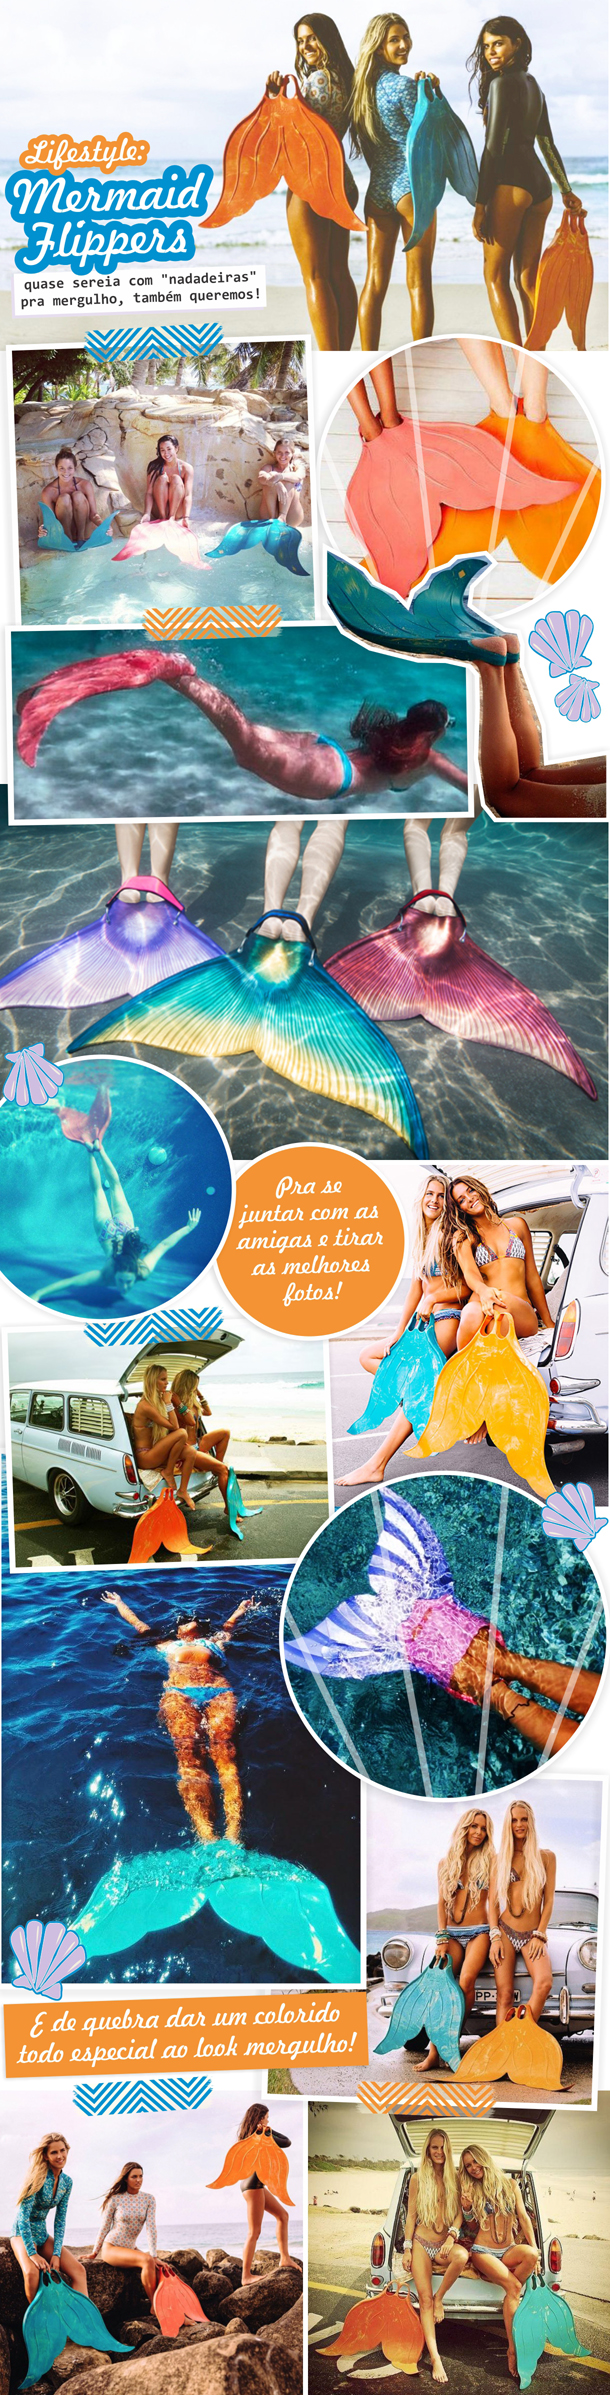 mundo-lolita-mermaid-flippers